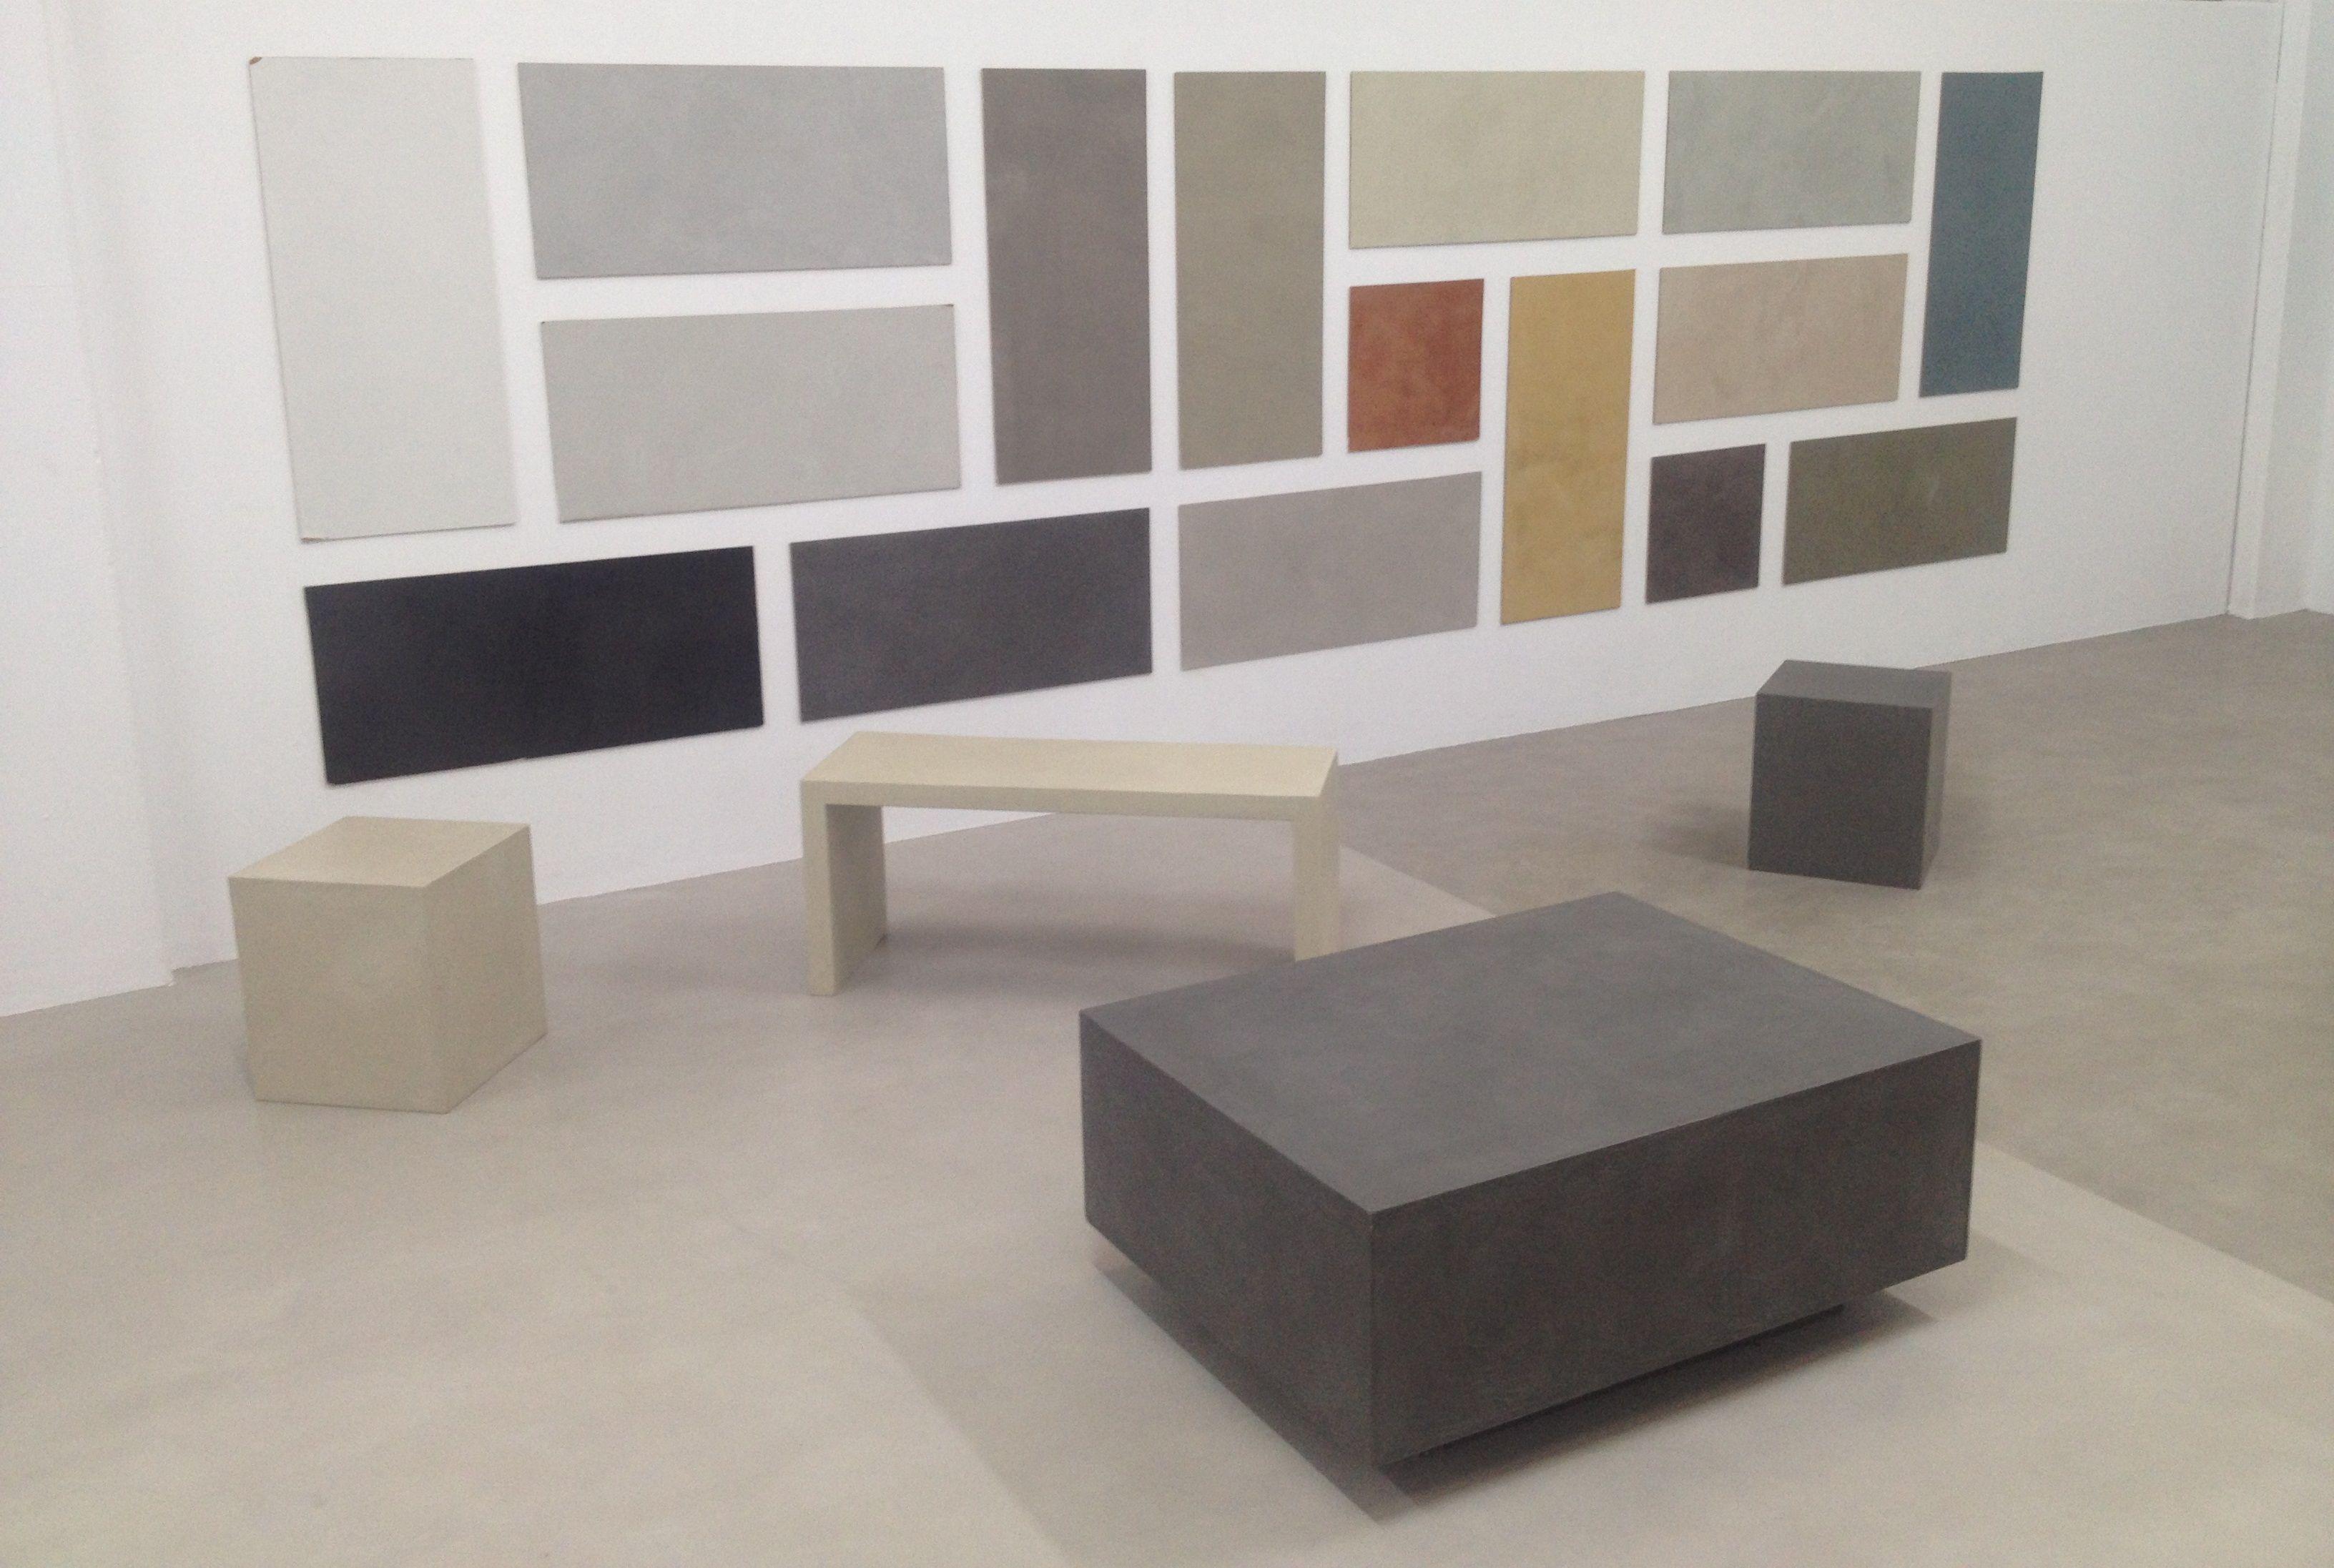 Beton cire microcemento cemento pulido colores showroom